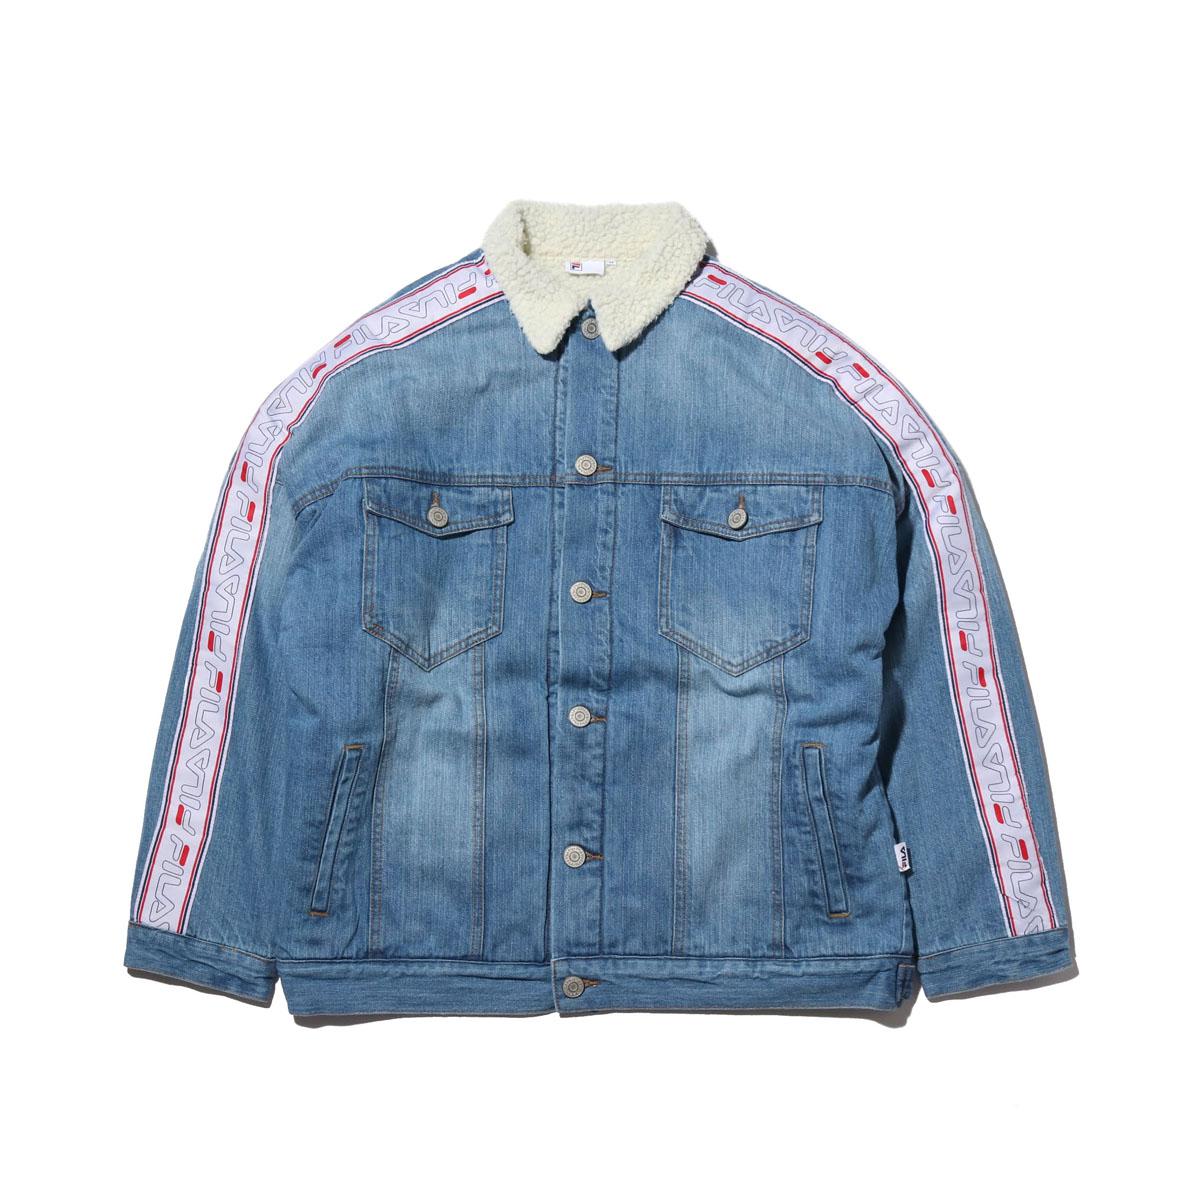 FILA Denim boa Jacket (フィラ デニム ボア ジャケット)BLUE【メンズ ジャケット】18FW-I